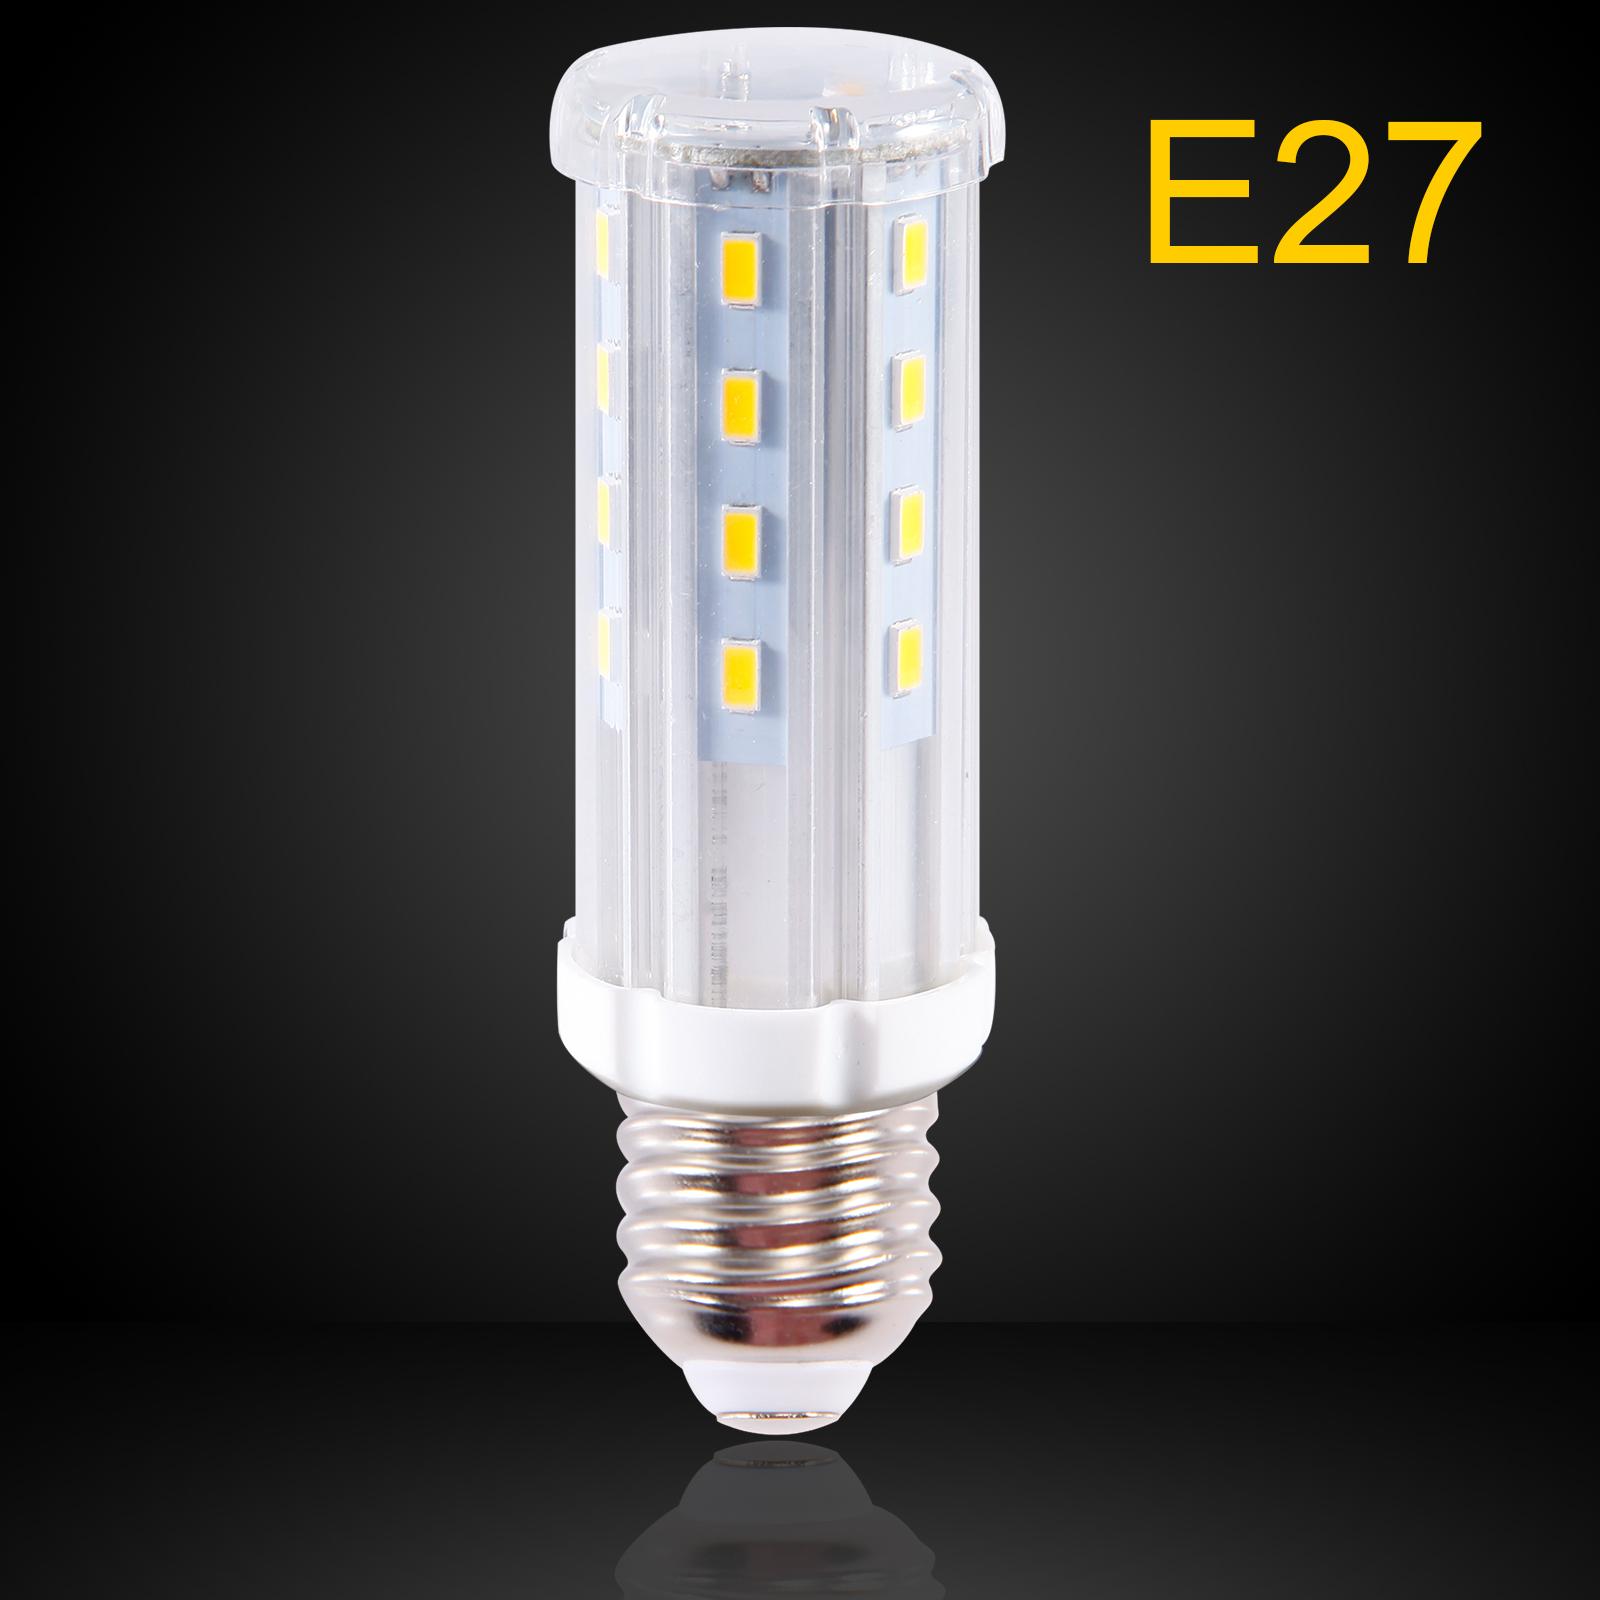 ampoule mais lampe leds e27 e14 6w 8w 10w smd 5730 blanc froid chaud luminosit ebay. Black Bedroom Furniture Sets. Home Design Ideas